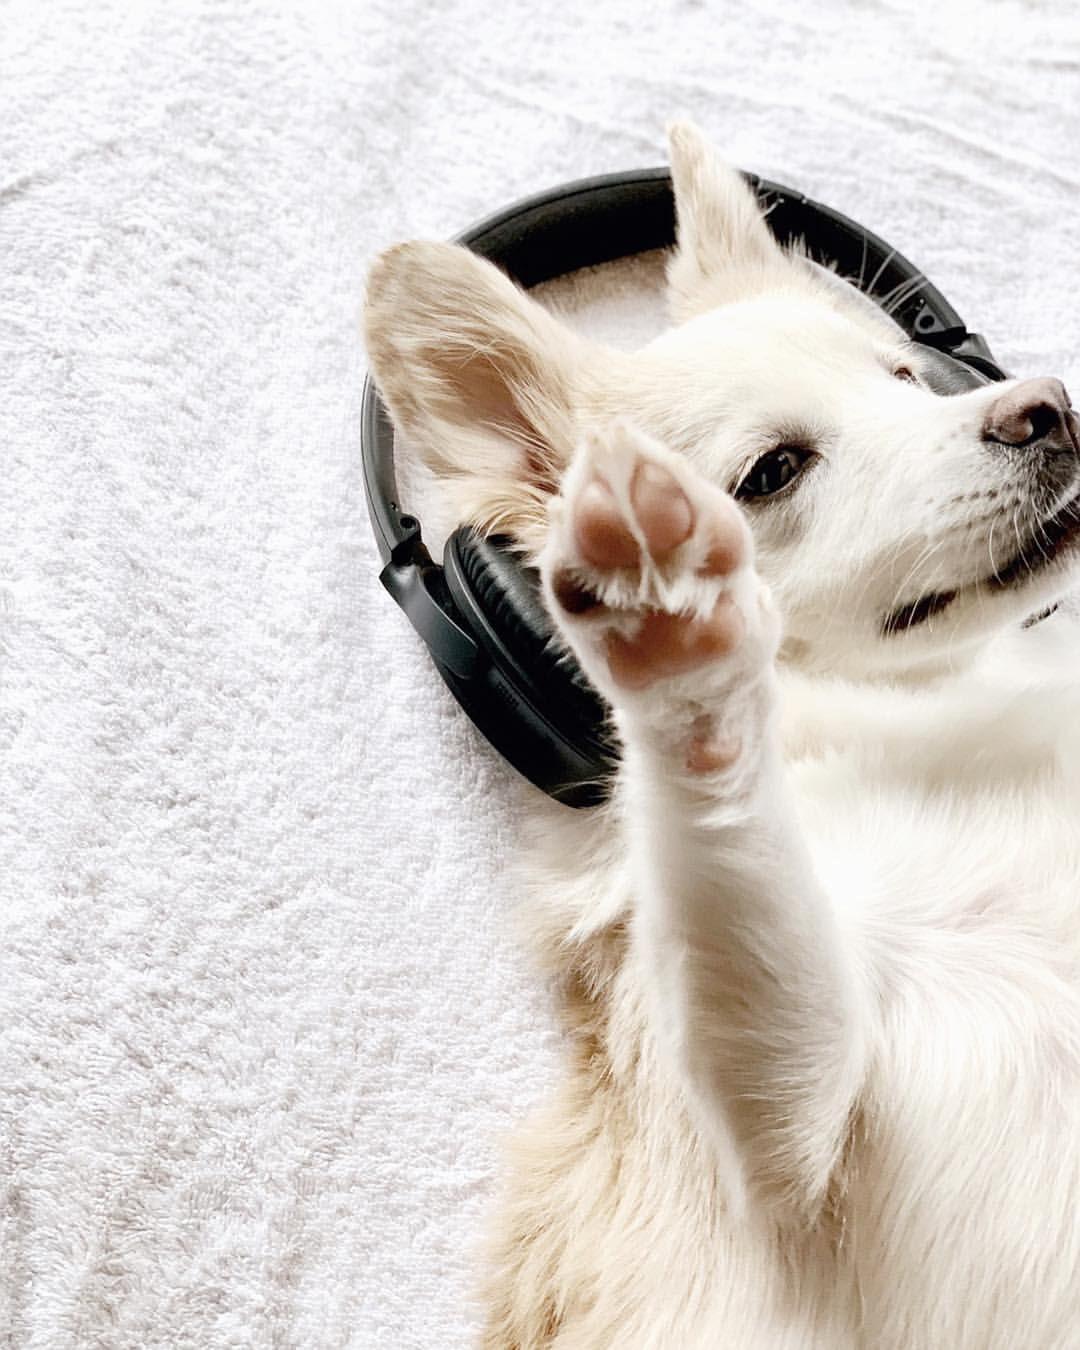 Cute Dog In Headphones Fa Lalalala Lala La La Christmas Carols On Repeat What S On Your Playlist Today Musicislife Christmas Carol Cute Dogs Carole